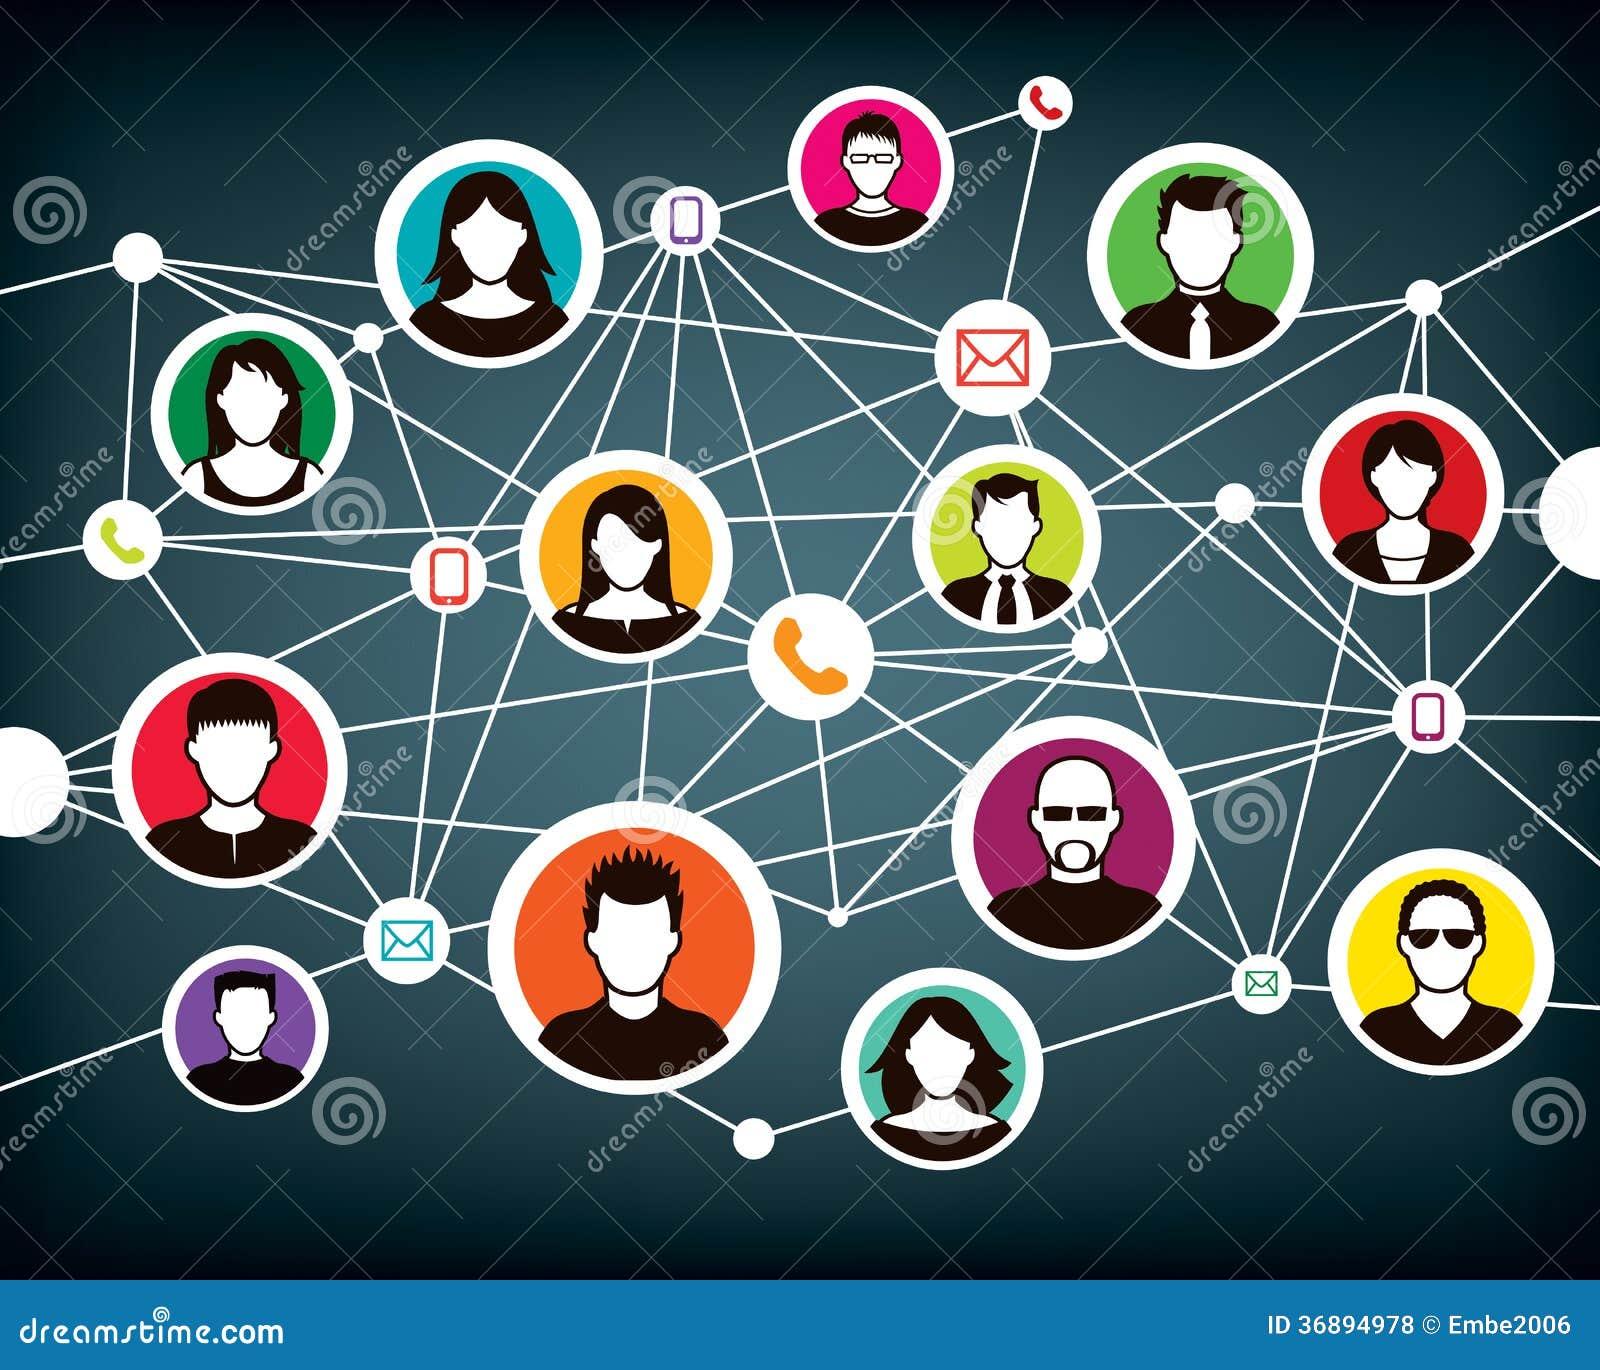 Communication Network People